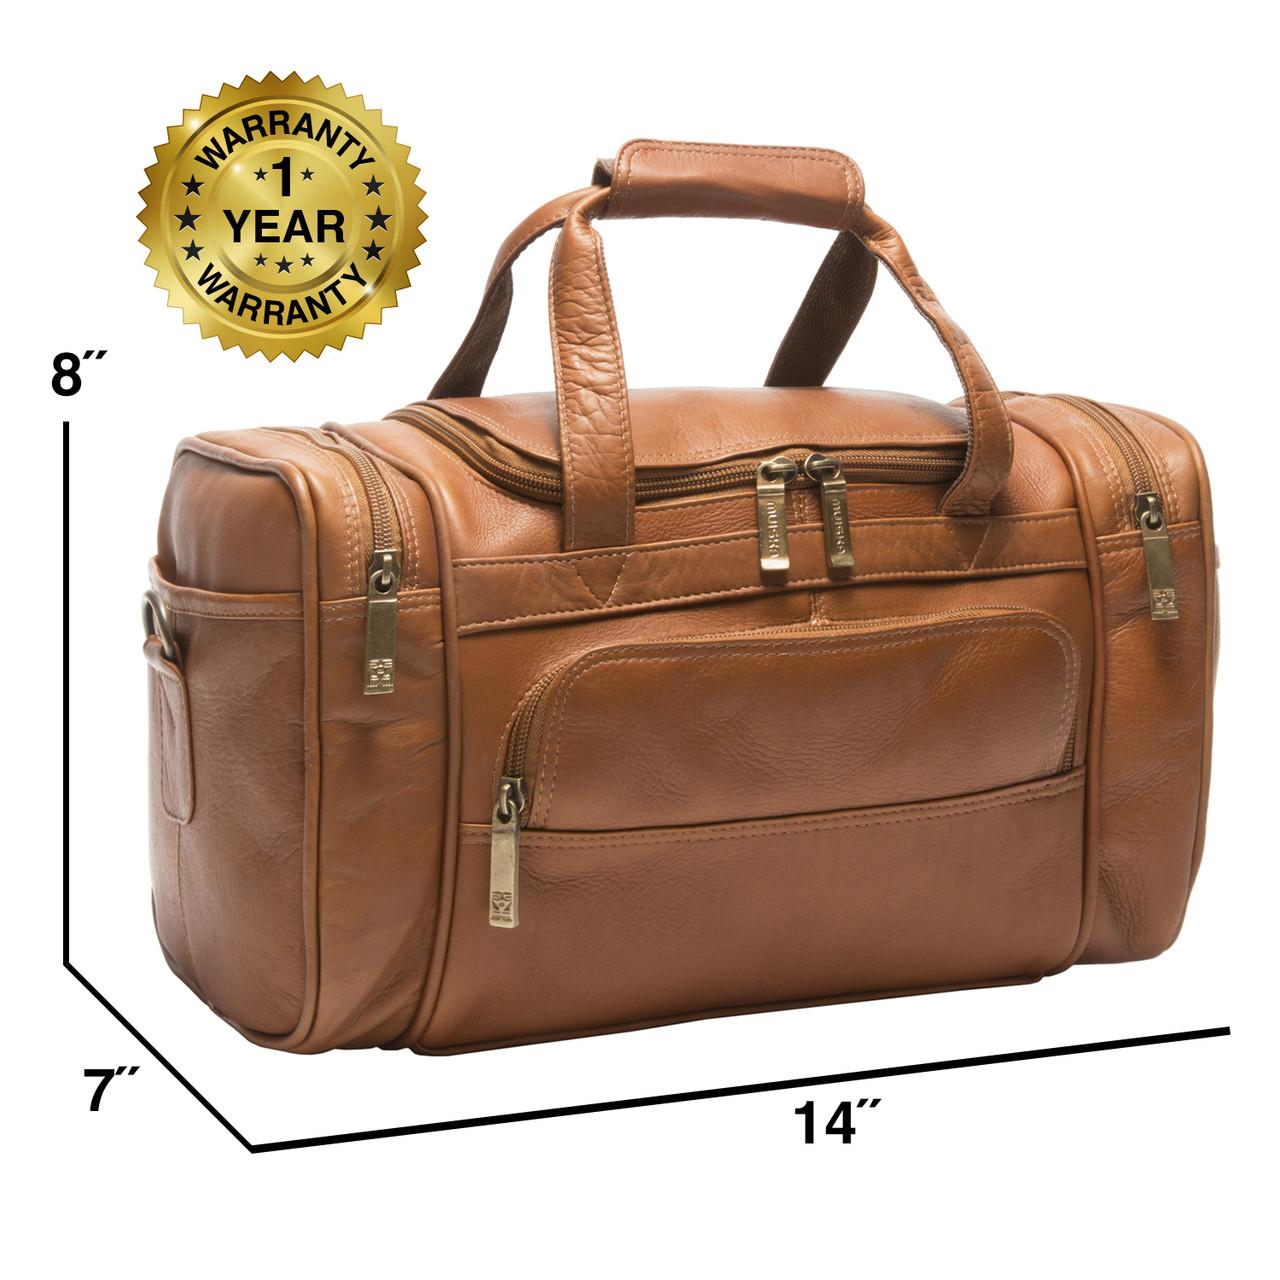 14-inch Small Sport Leather Duffel Bag | Marco by Muiska